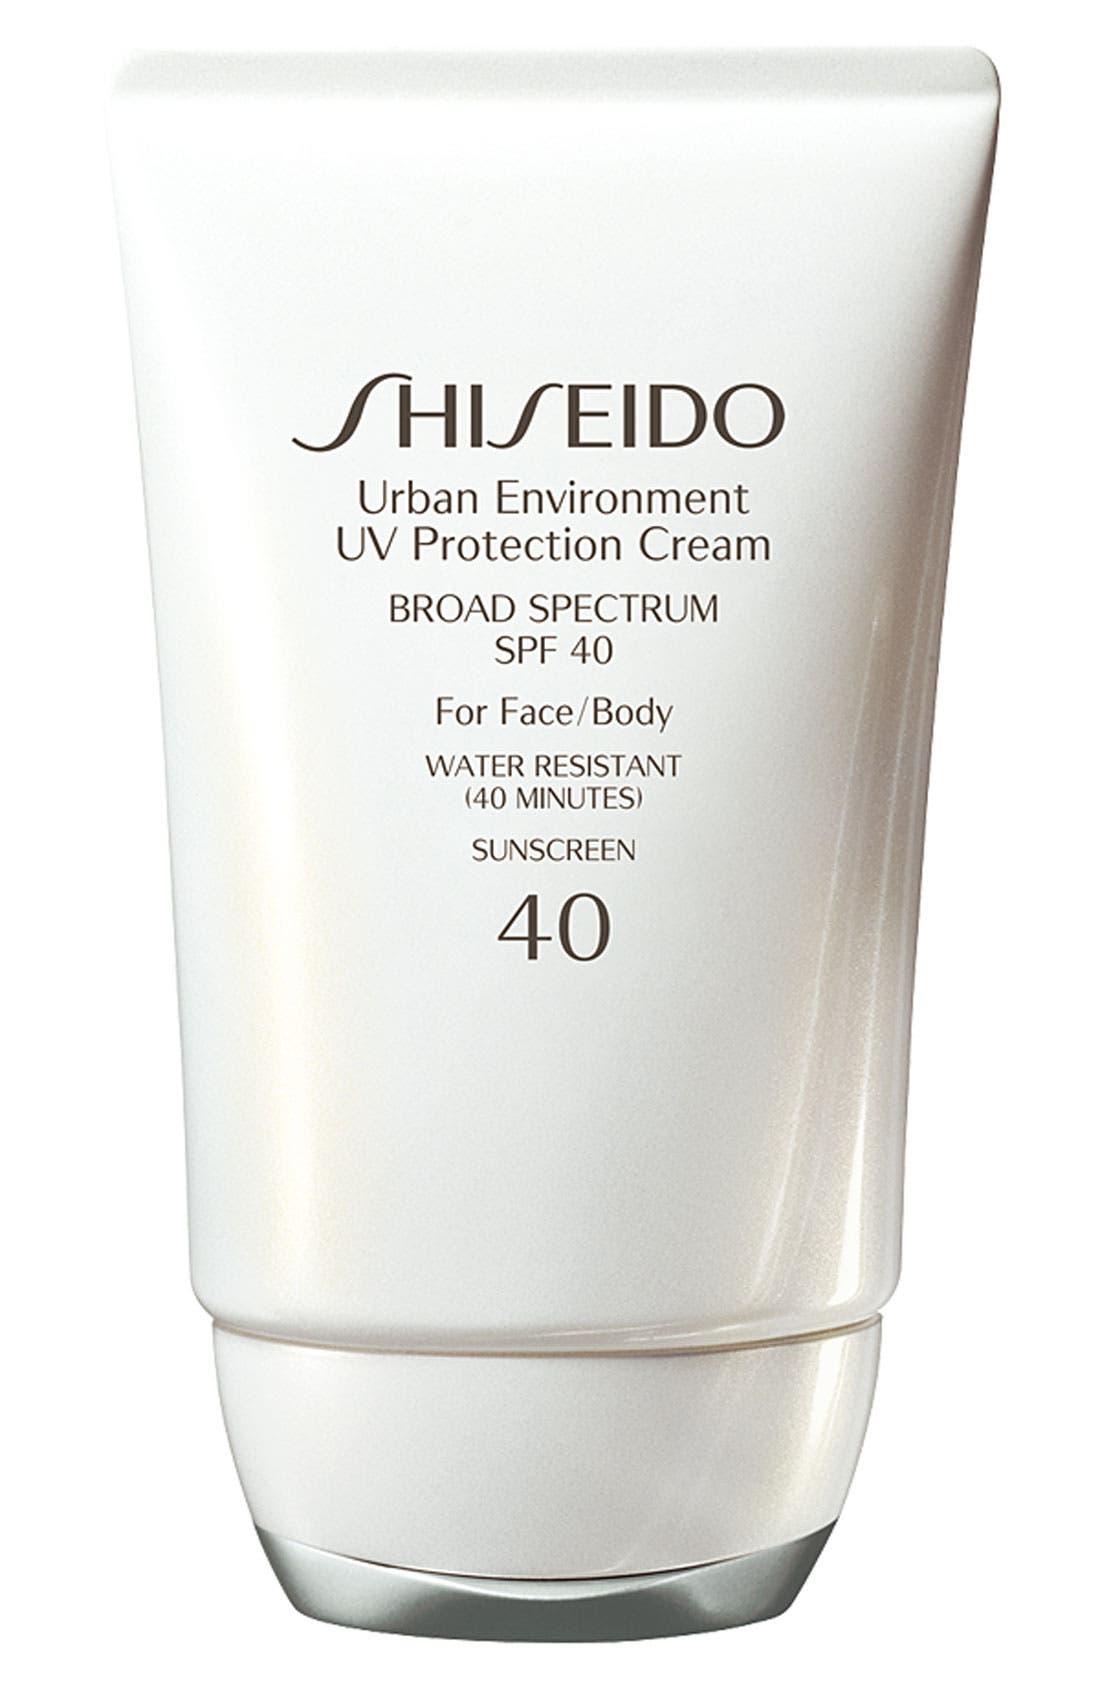 Shiseido 'Urban Environment' UV Protection Cream SPF 40